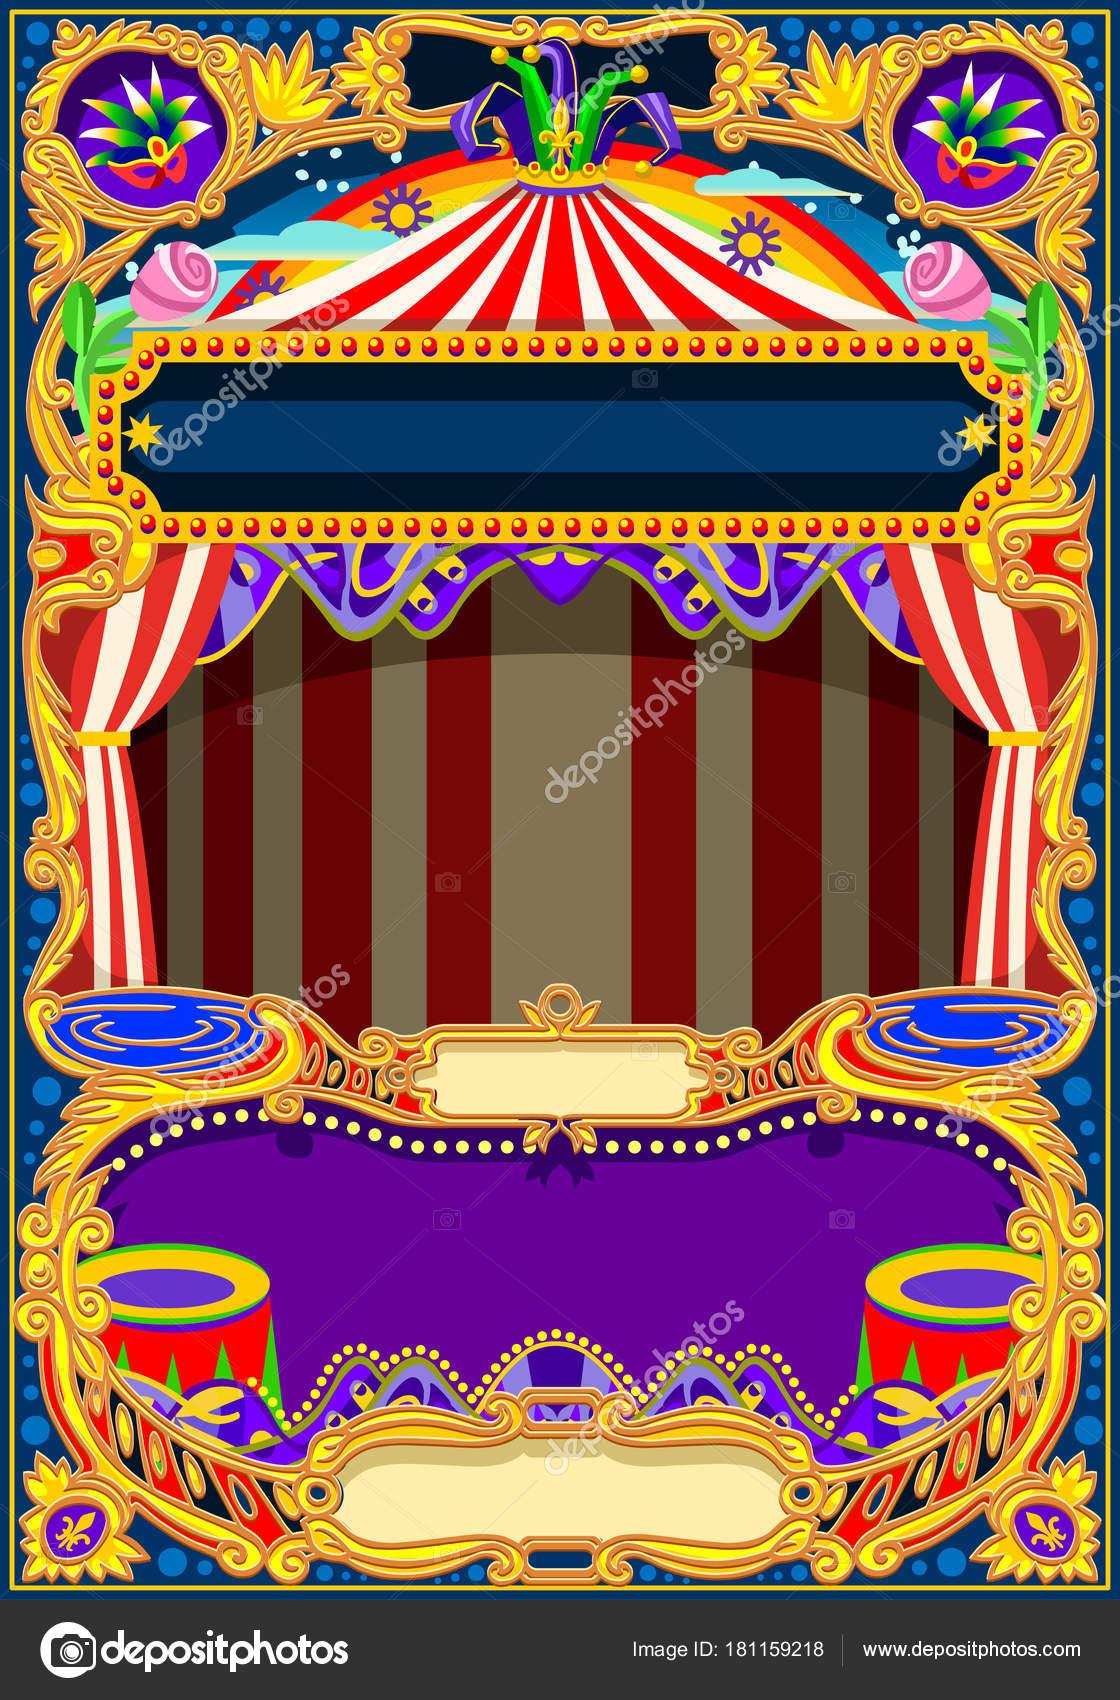 Circus-Wallpaper Vektor Rahmen — Stockvektor © aurielaki #181159218